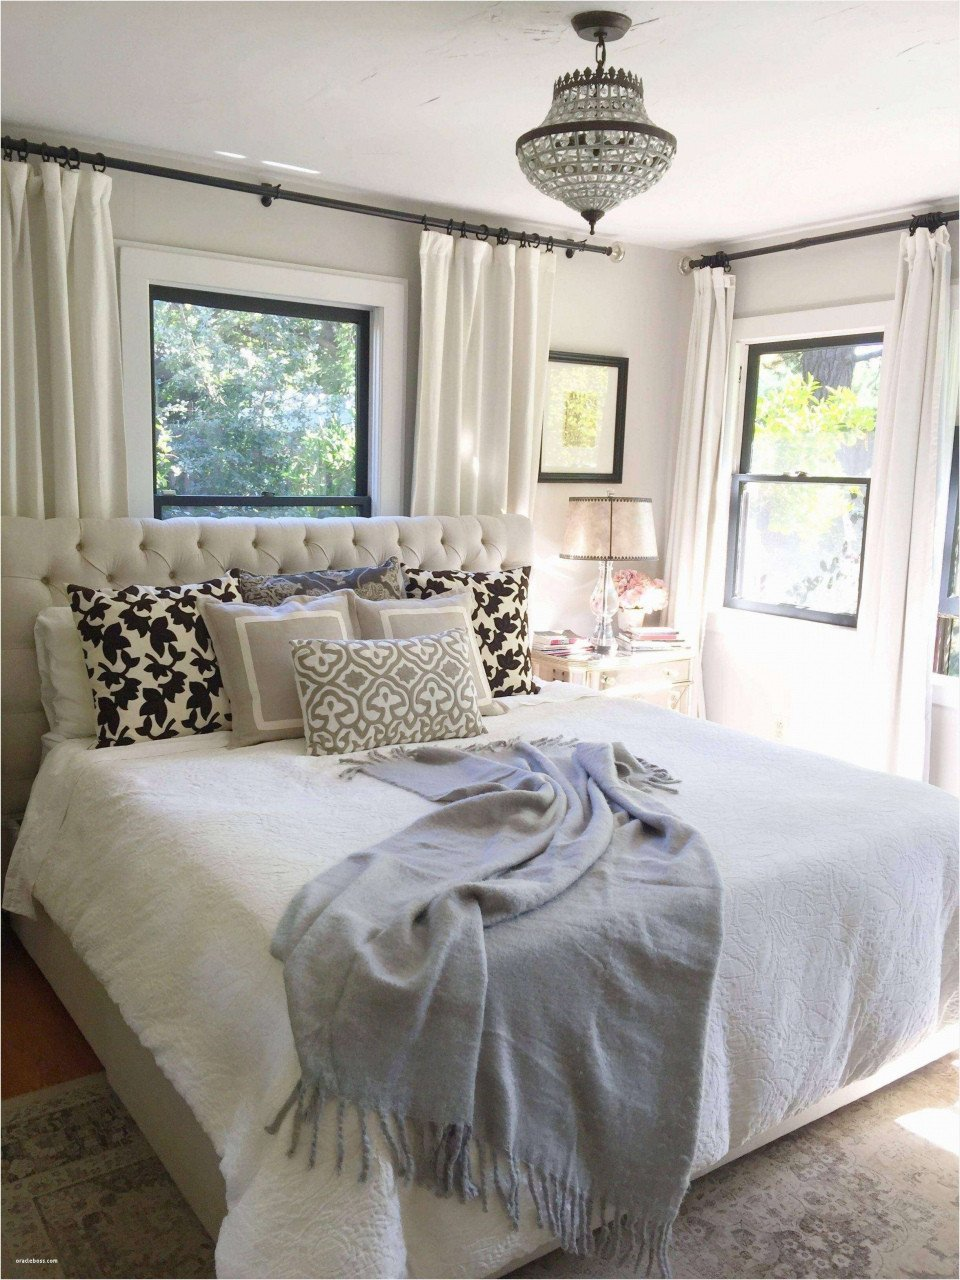 Bedroom Sitting area Ideas Best Of Bedroom Interior Design — Procura Home Blog